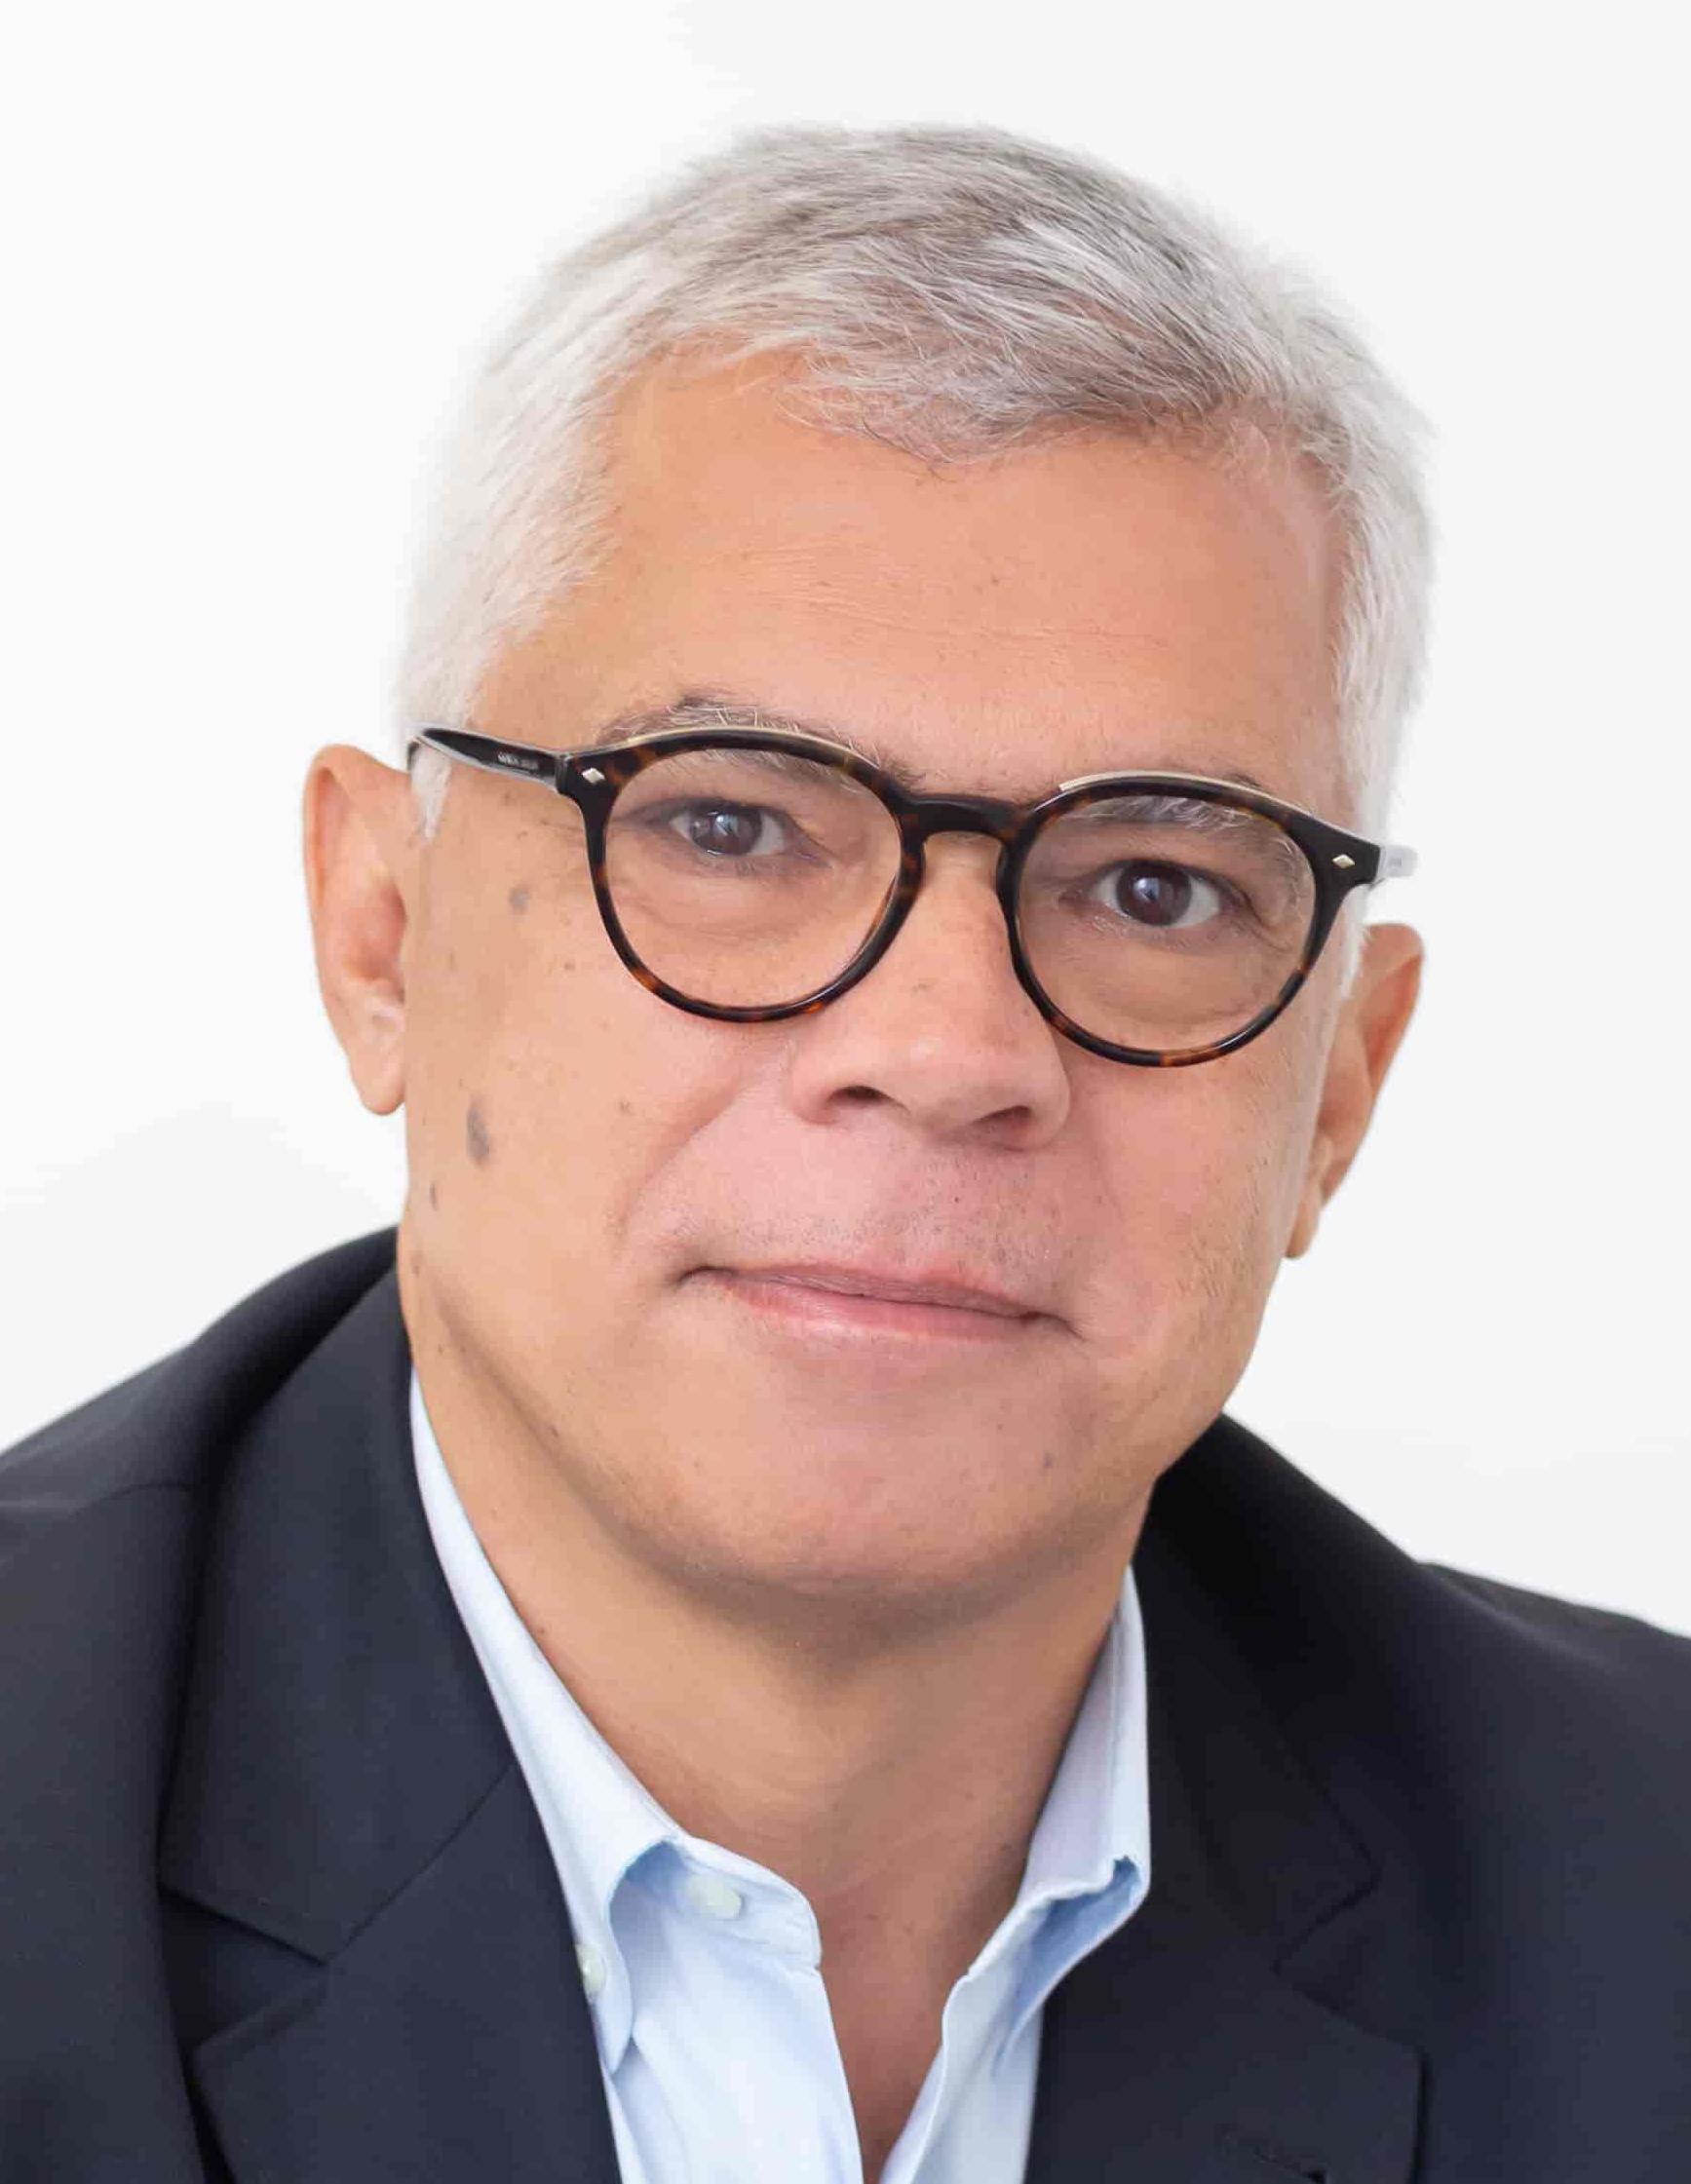 Gilson Santiago's photo - CEO of Masternaut